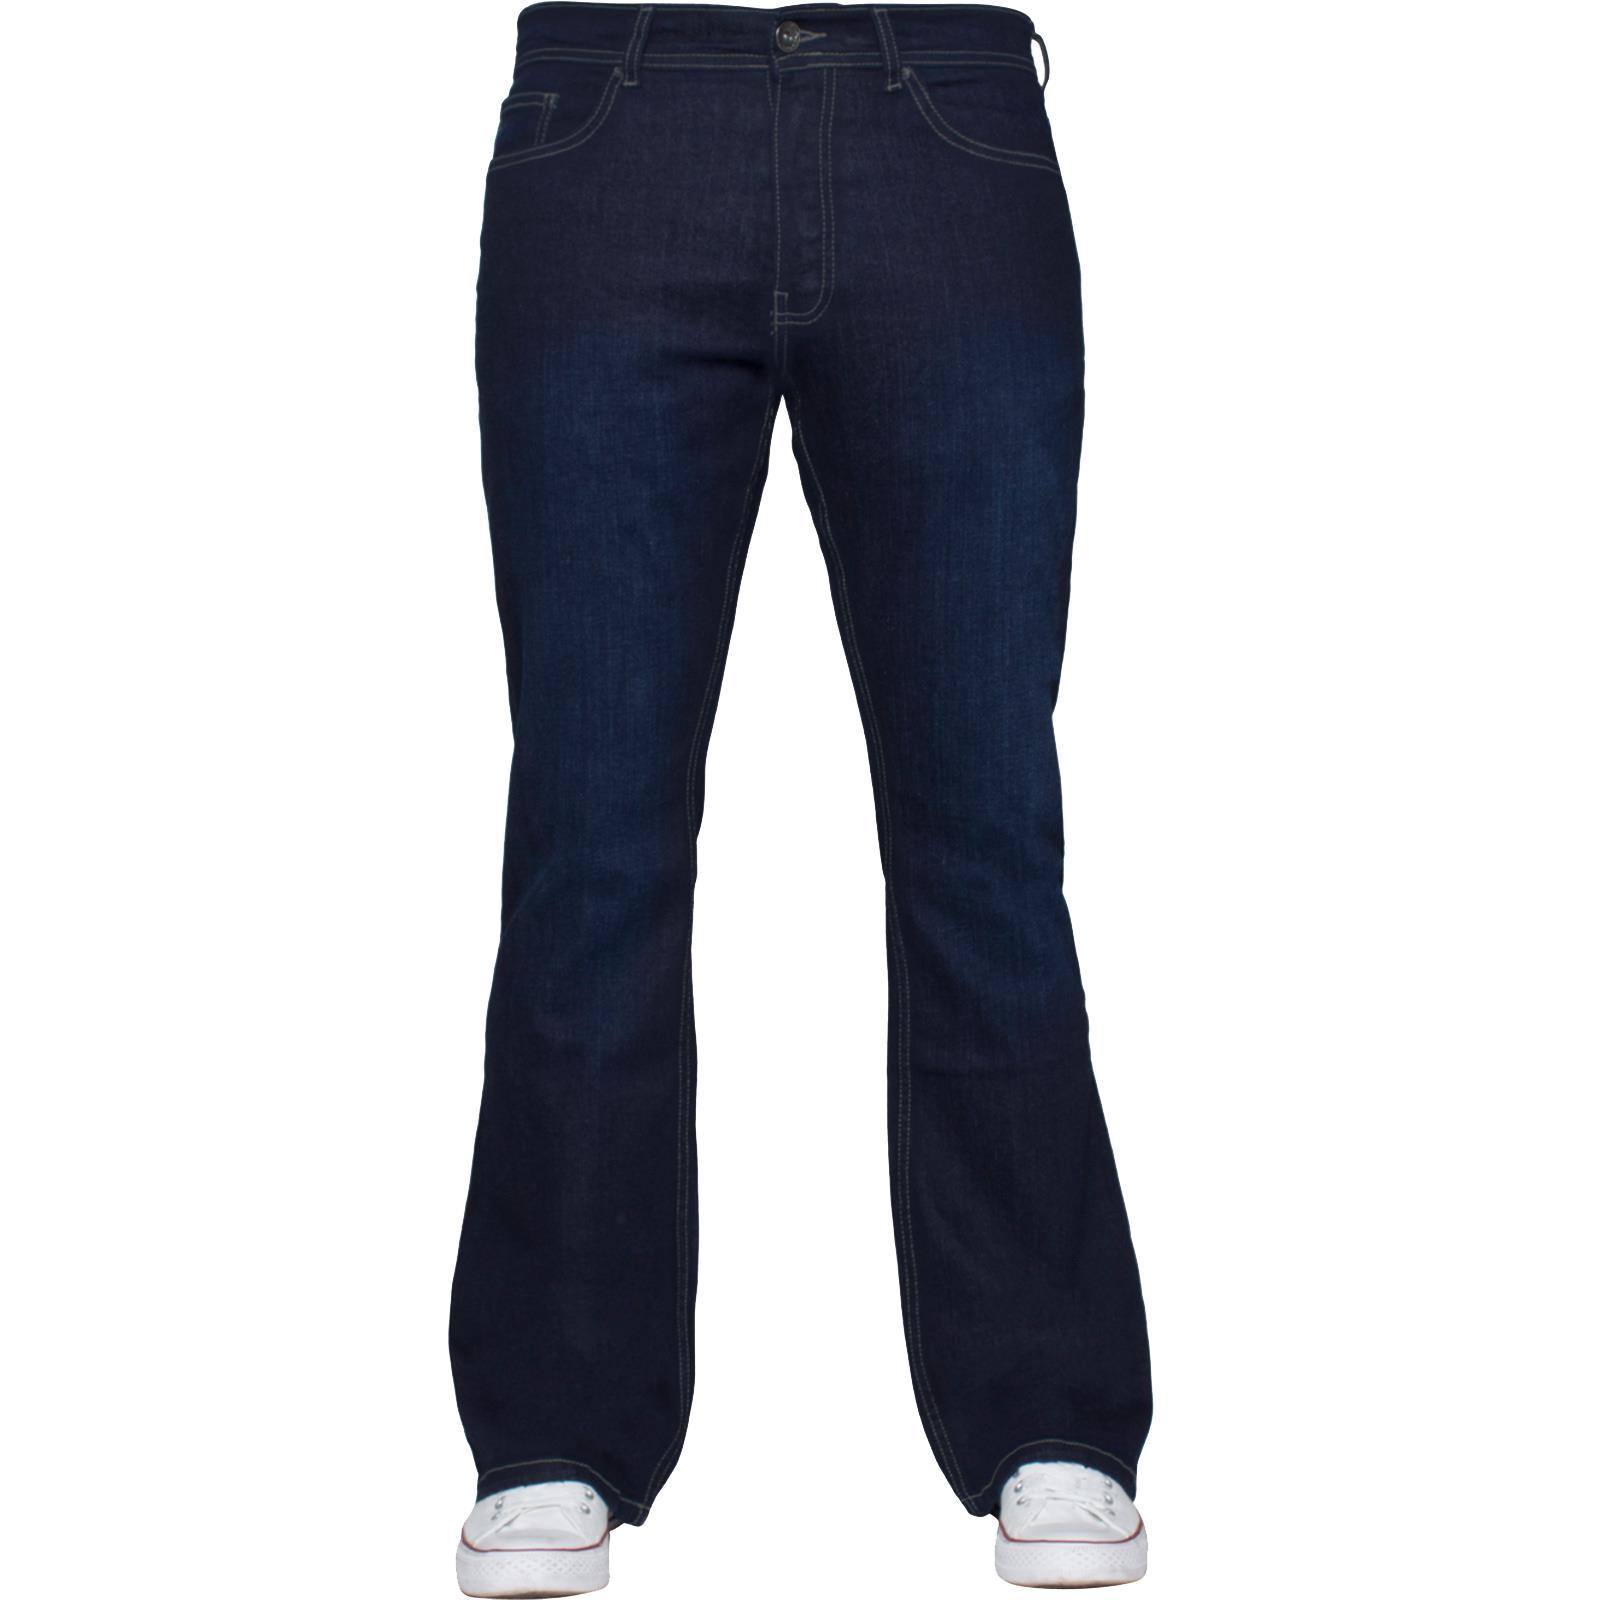 ENZO-diseno-para-hombre-Bootcut-Stretch-Jeans-Acampanados-Pierna-Ancha-Pantalones-De-Mezclilla-todas miniatura 18